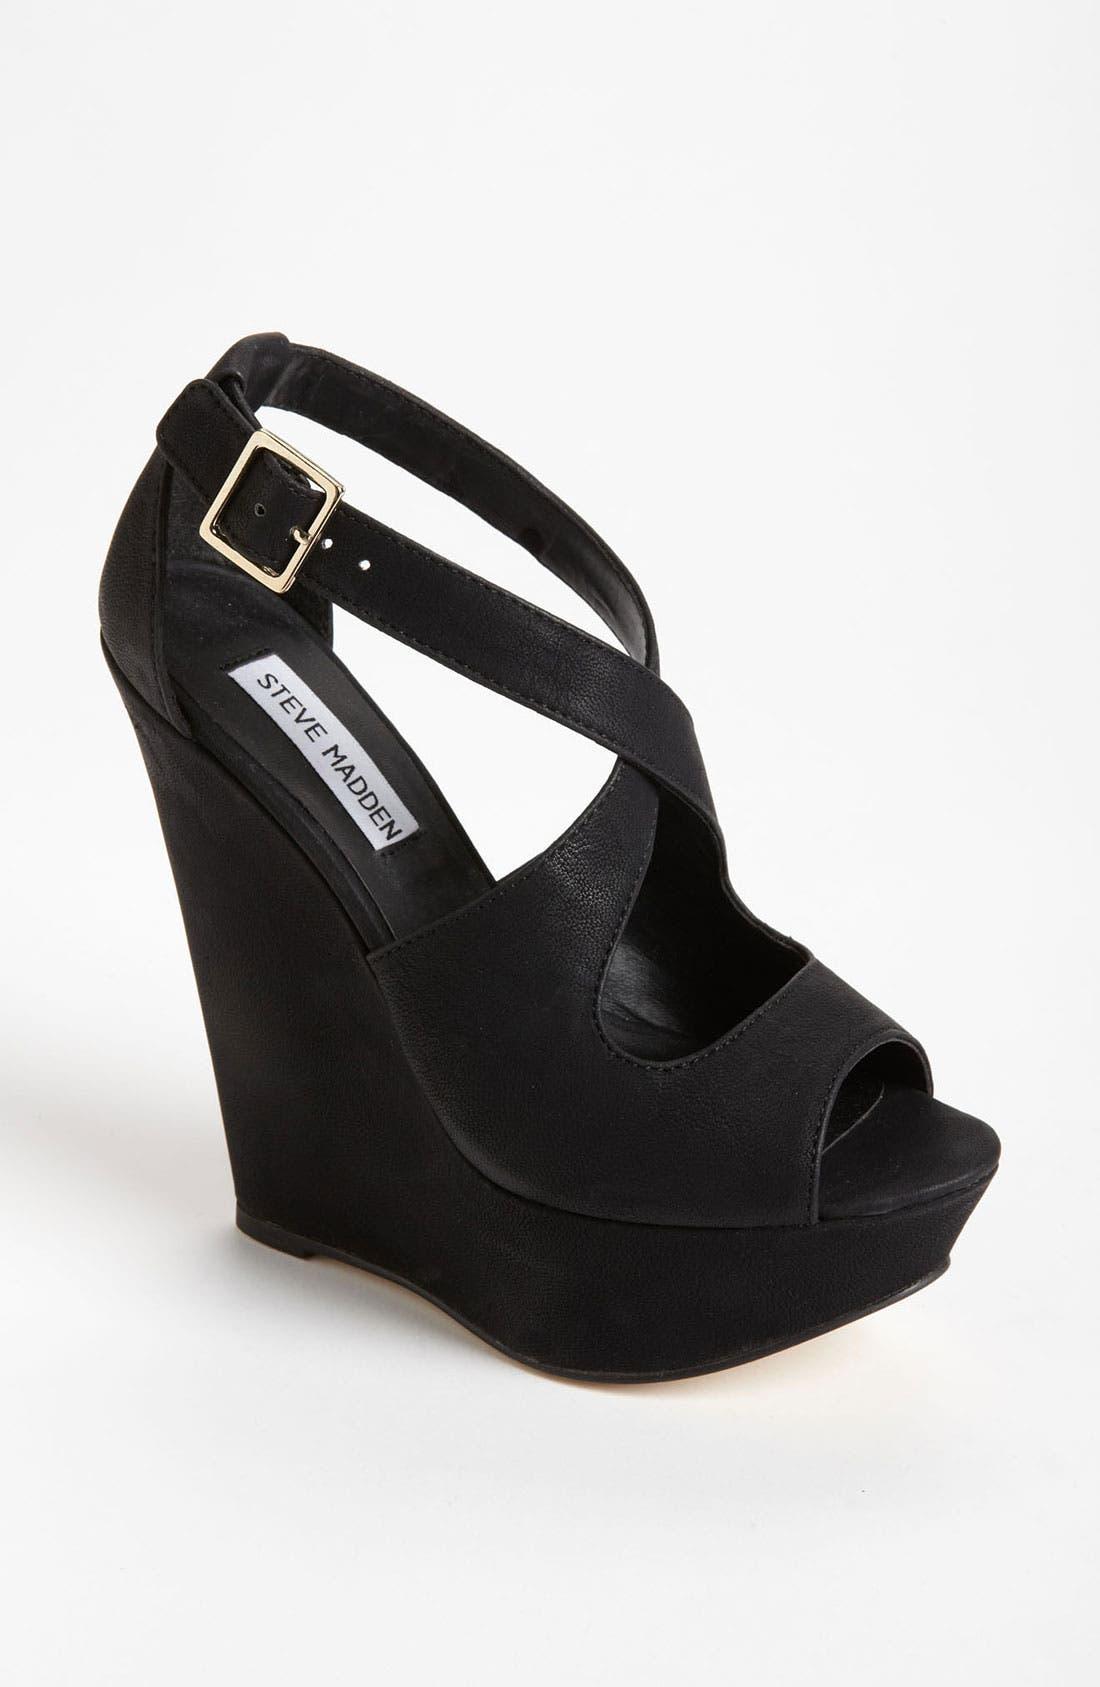 'Xternal' Wedge Sandal,                             Main thumbnail 1, color,                             Black